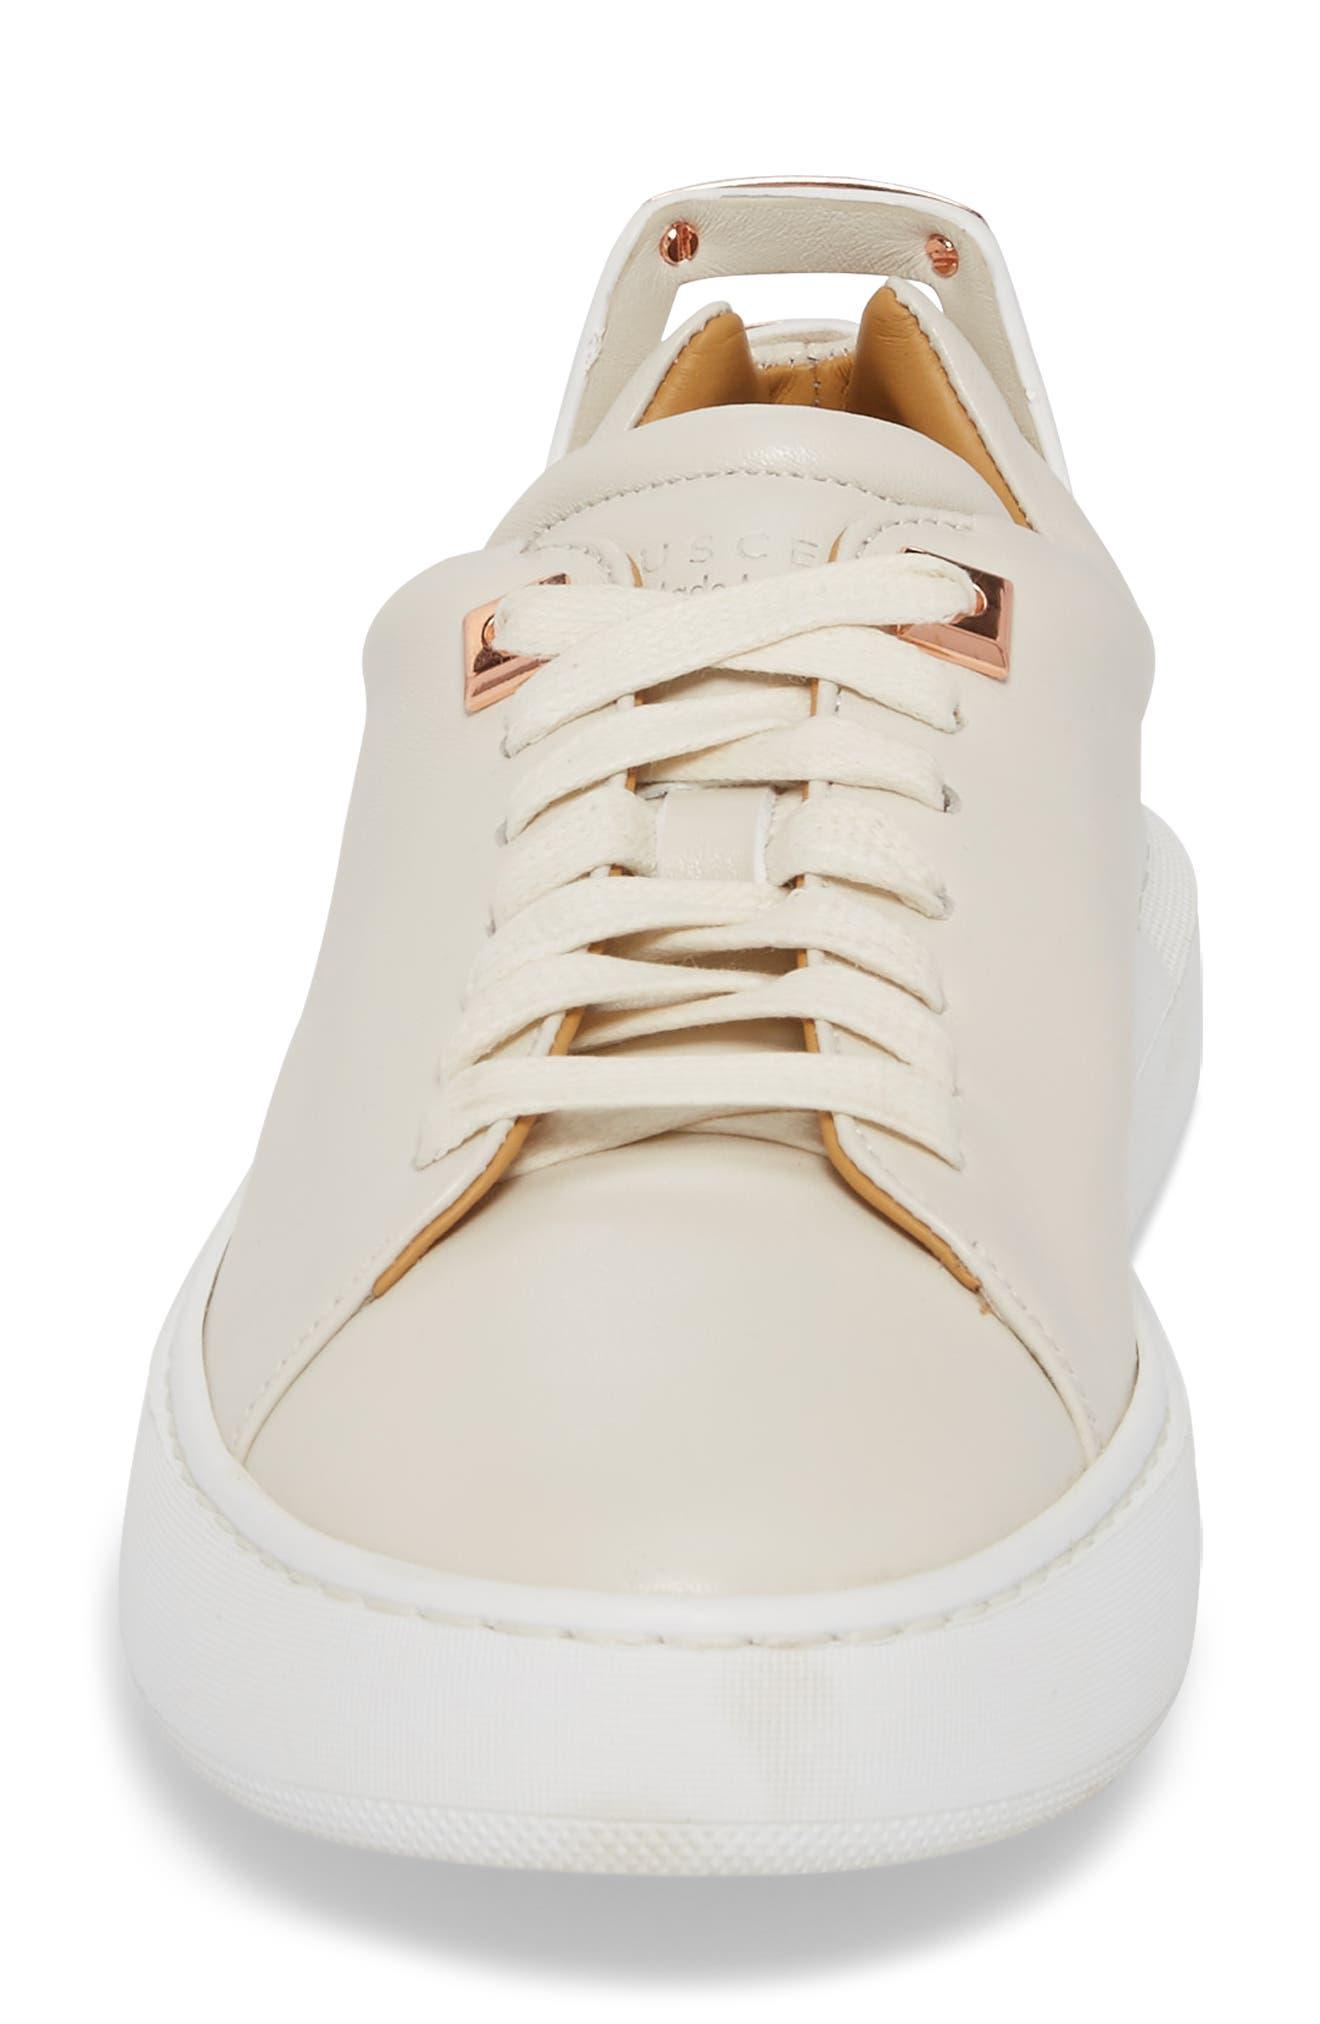 Uno Low Top Sneaker,                             Alternate thumbnail 8, color,